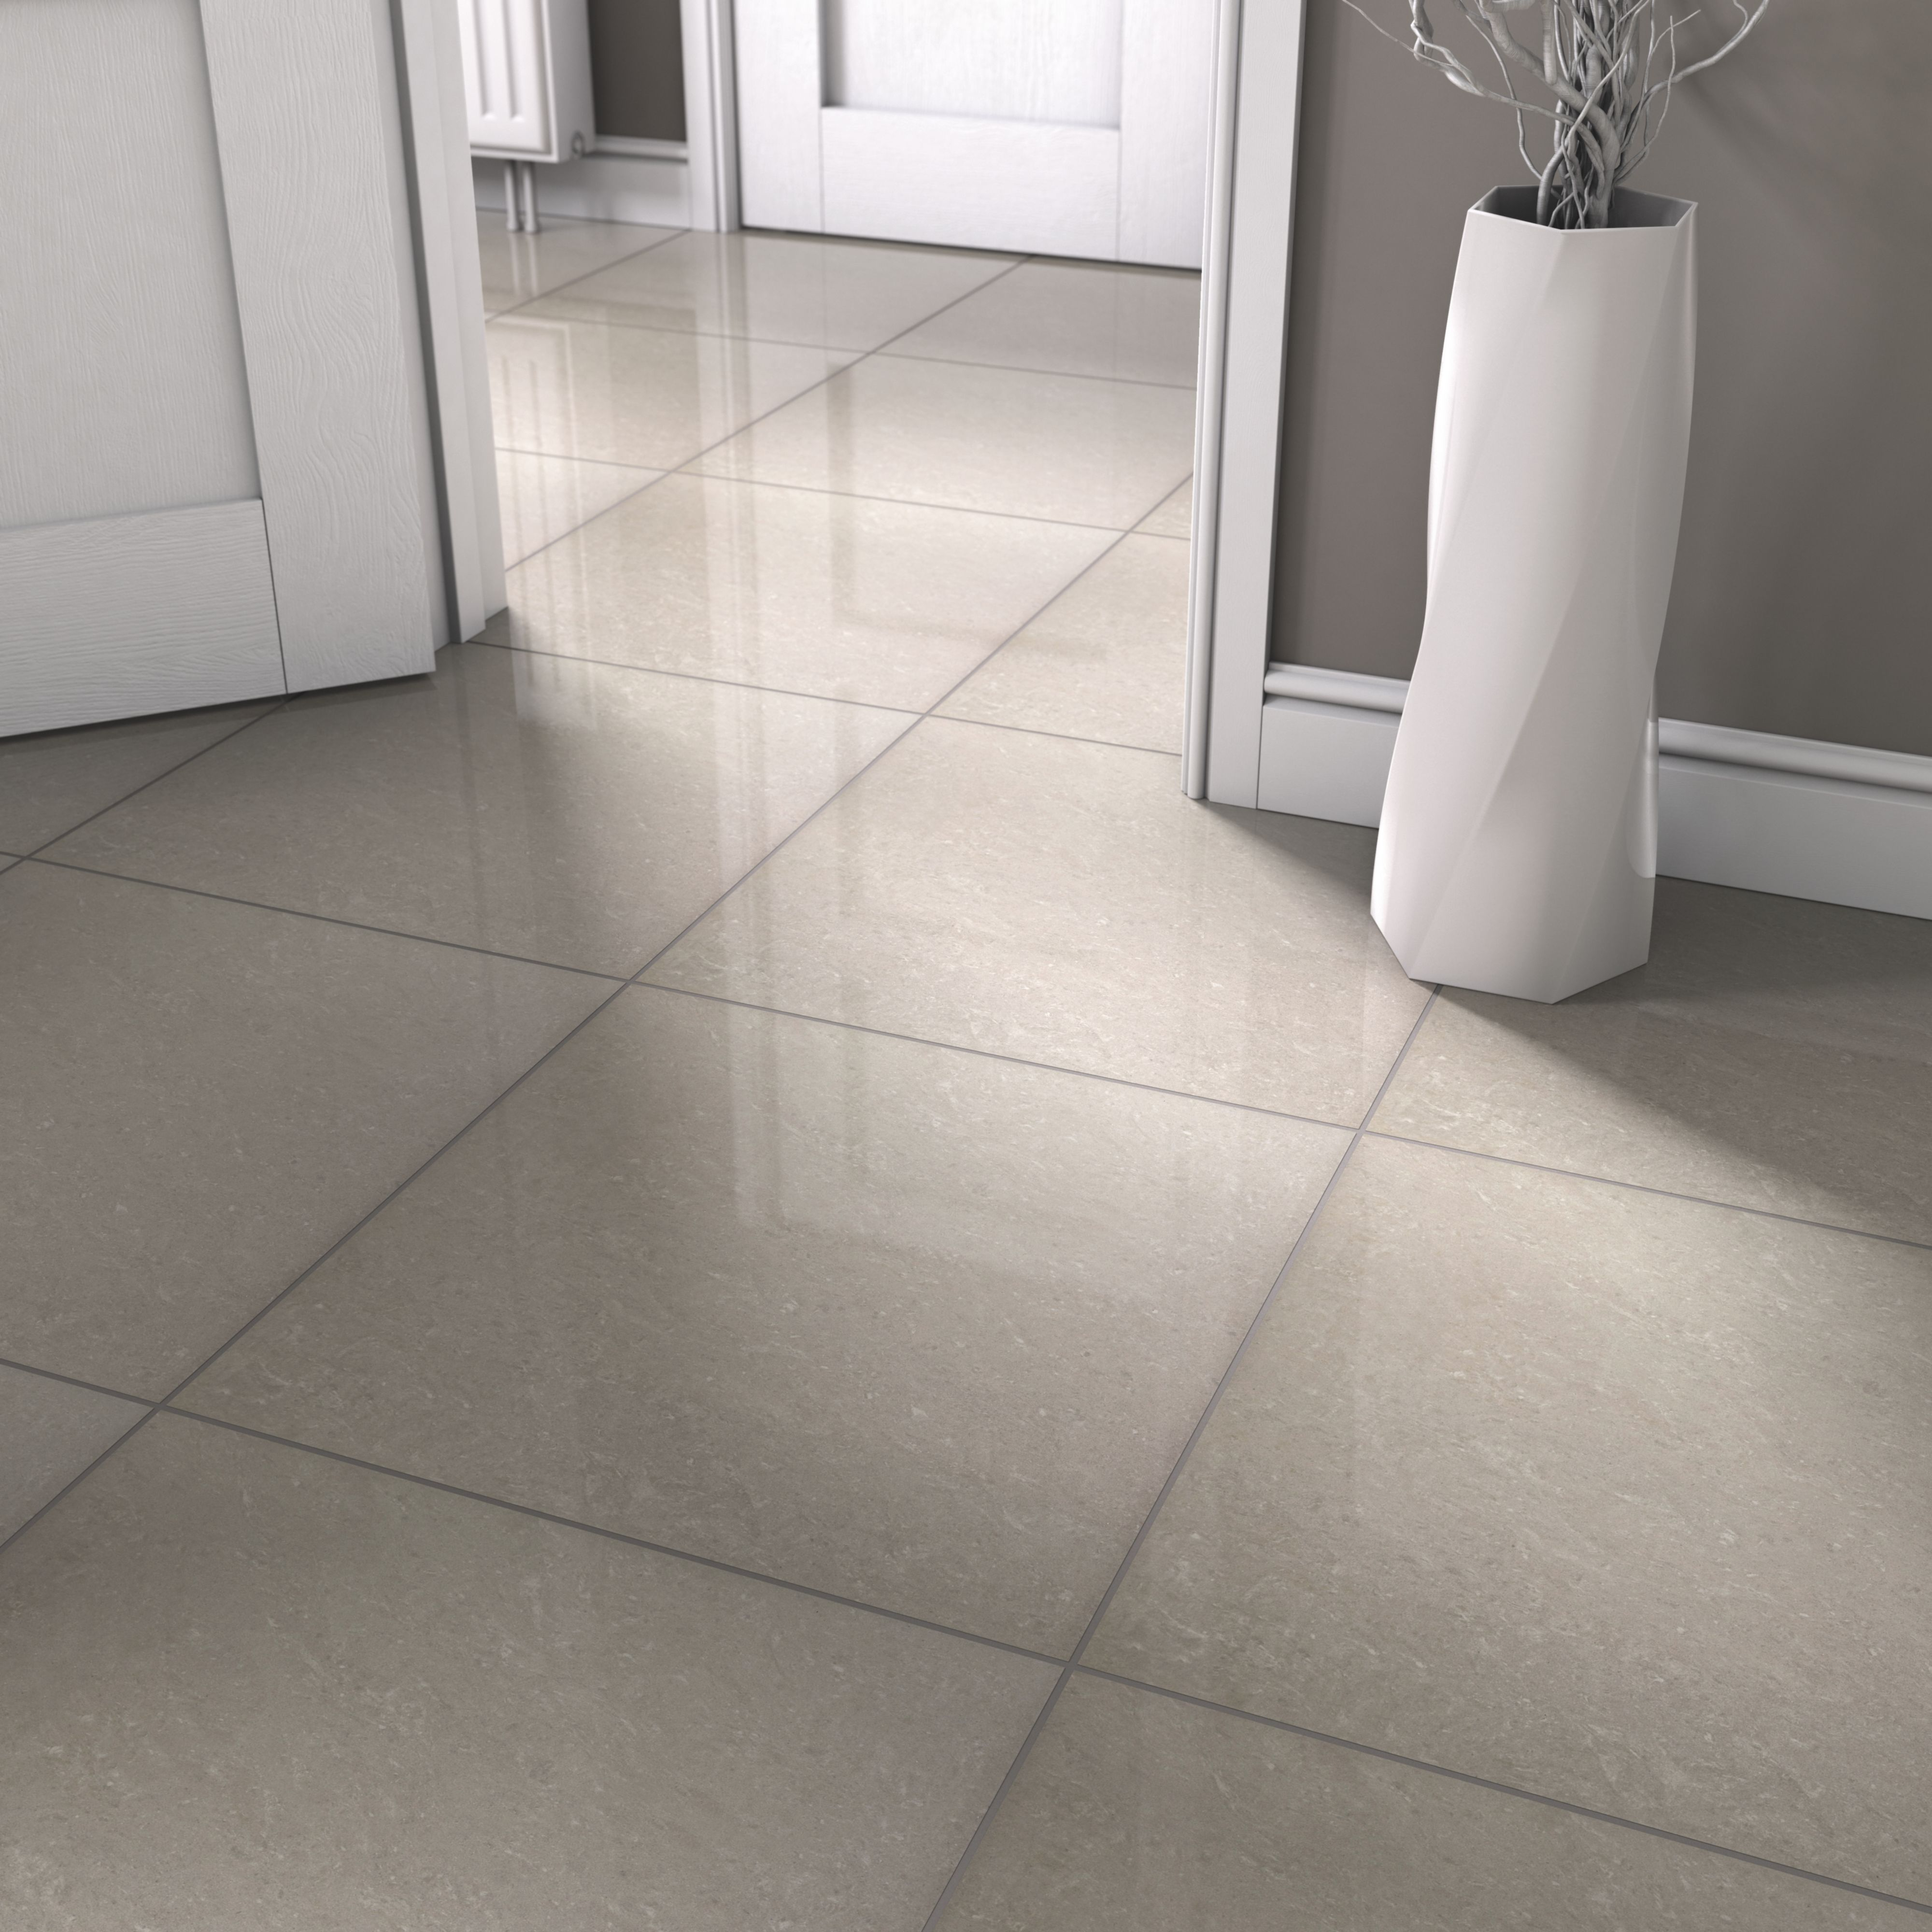 uyxneykrqrha product flooring for floors tile india copy porcelain marble floor china market